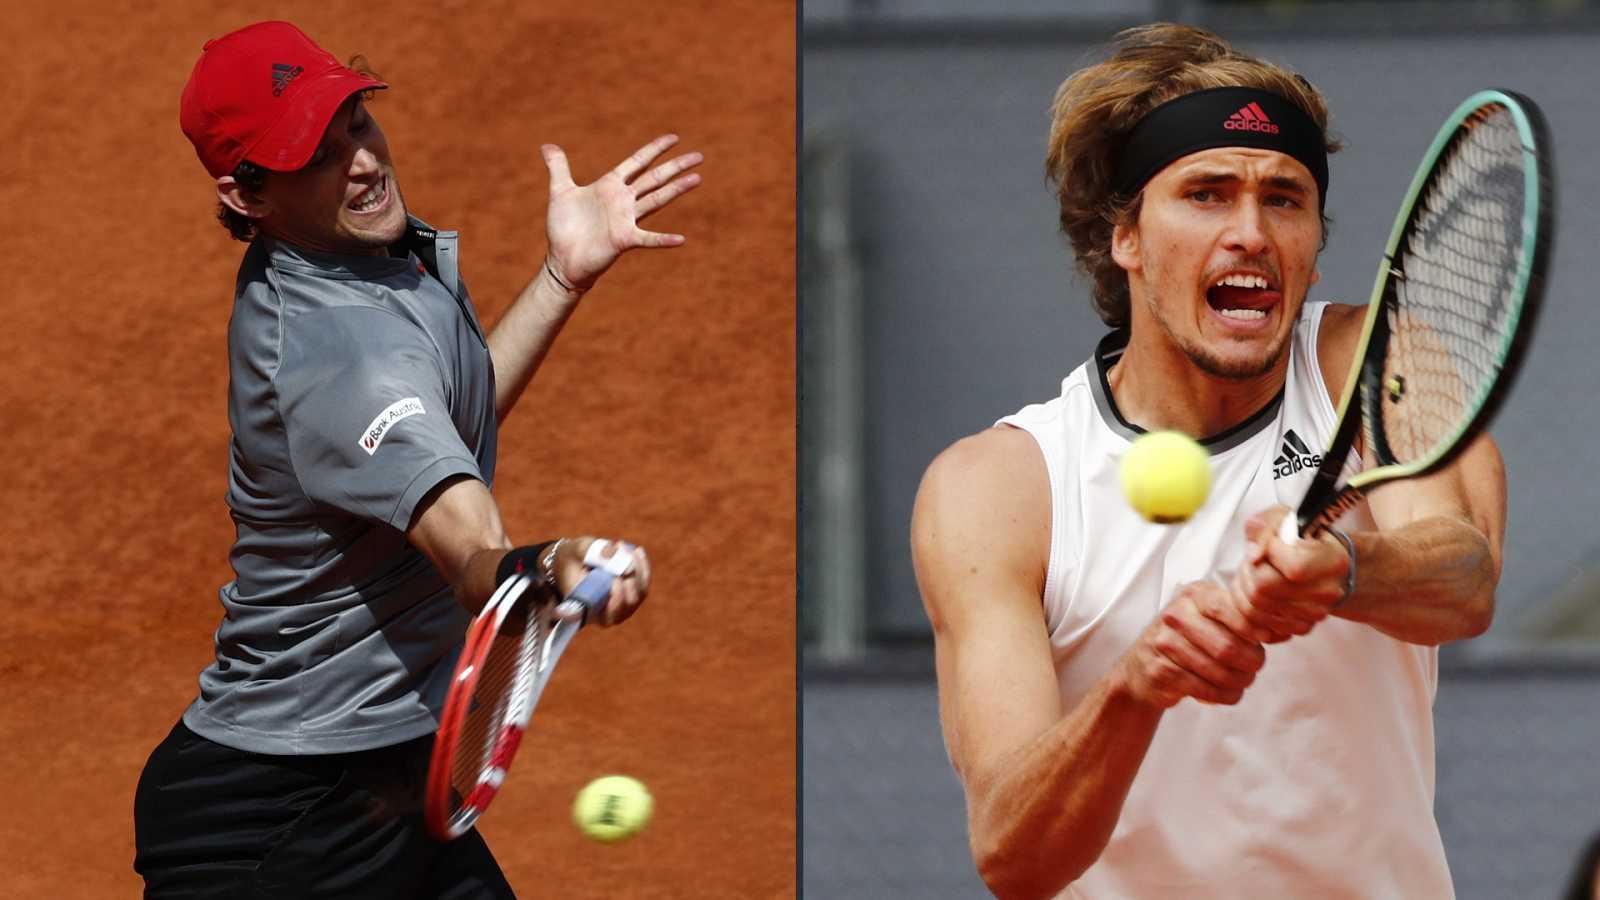 Tenis - ATP Mutua Madrid Open. 1ª Semifinal: Alexander Zverev - Dominic Thiem - ver ahora